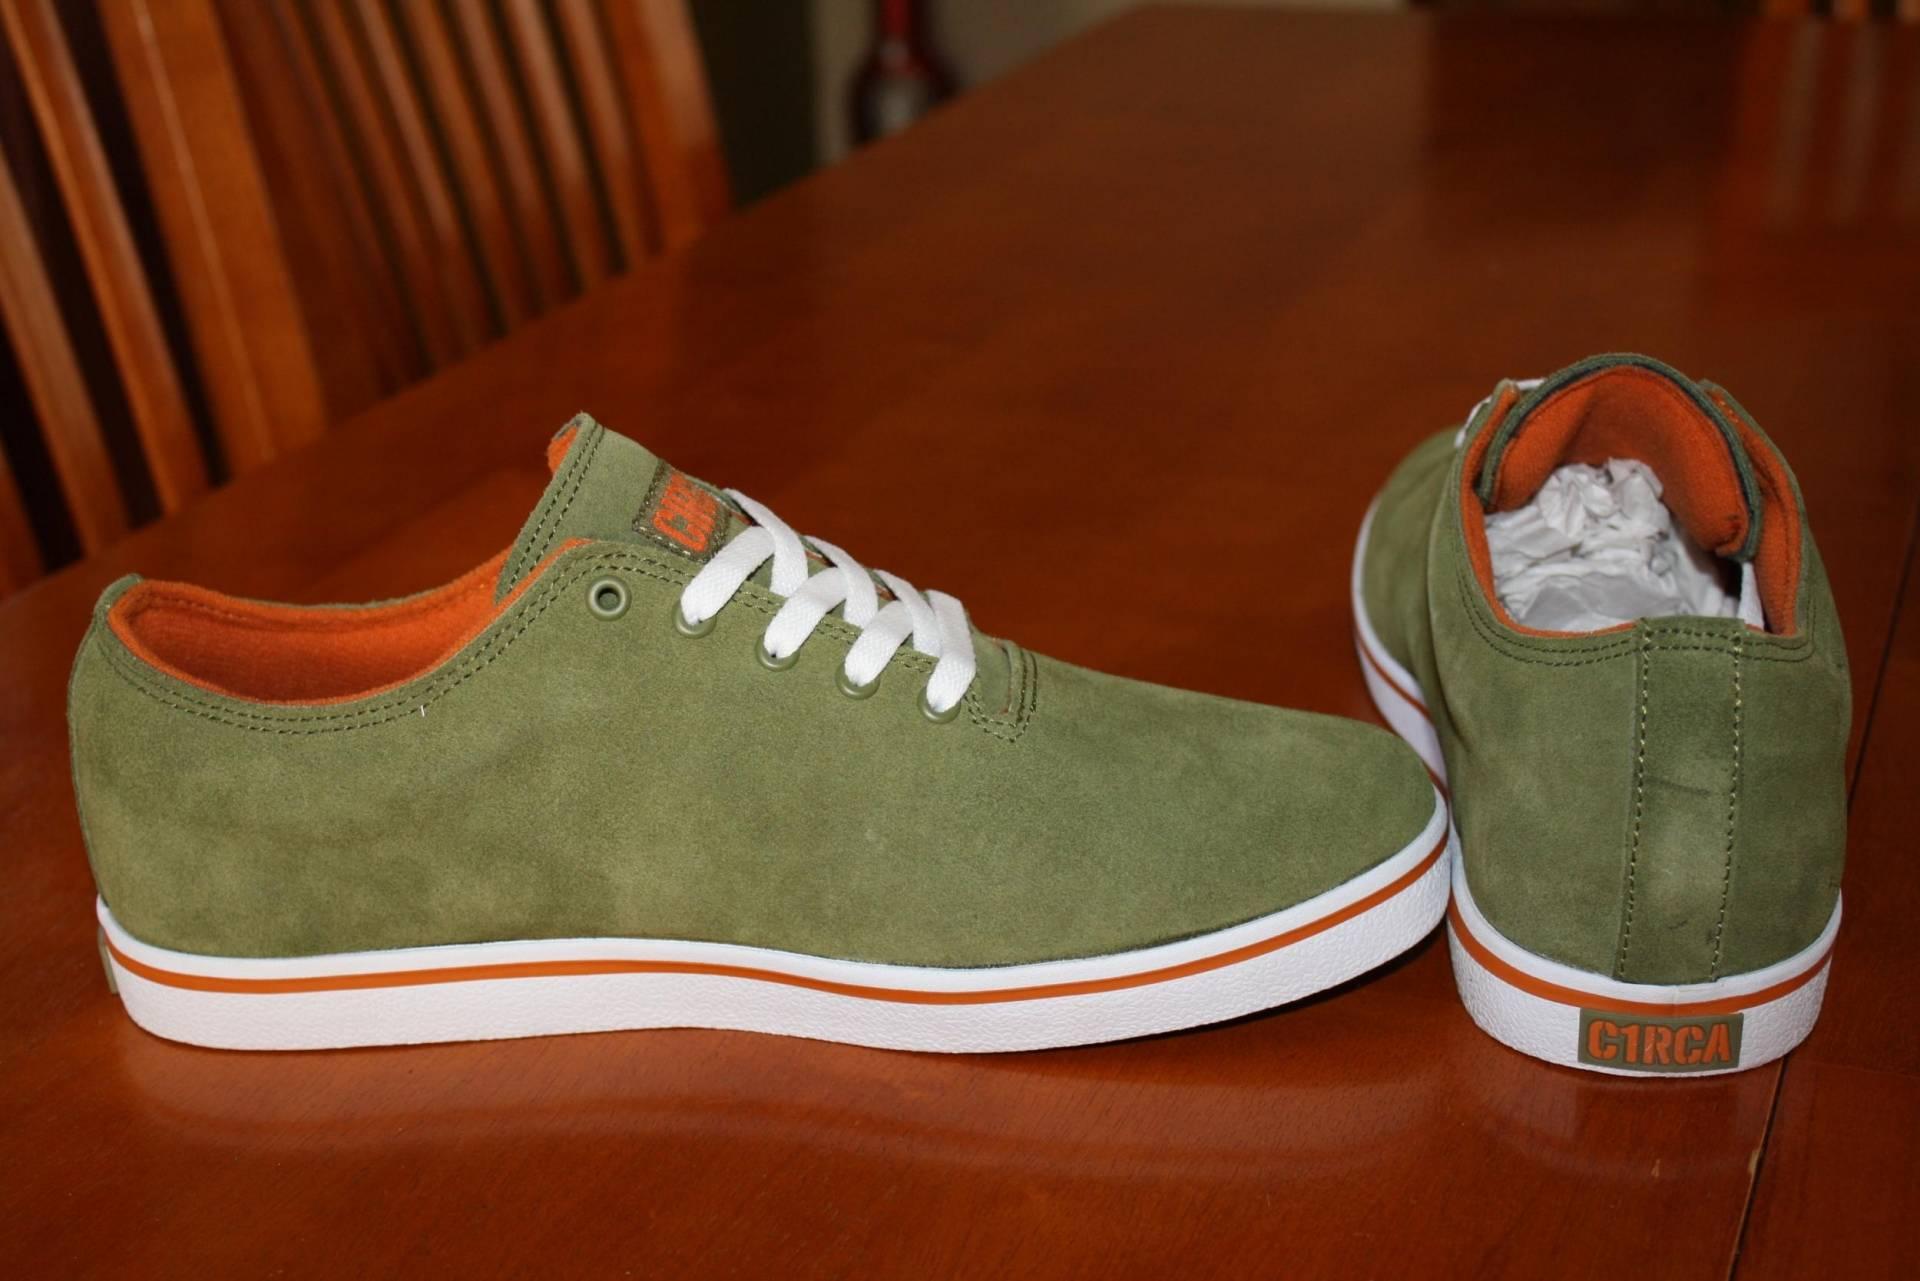 Skate shoes size 9 - File Size 165 9 Kb